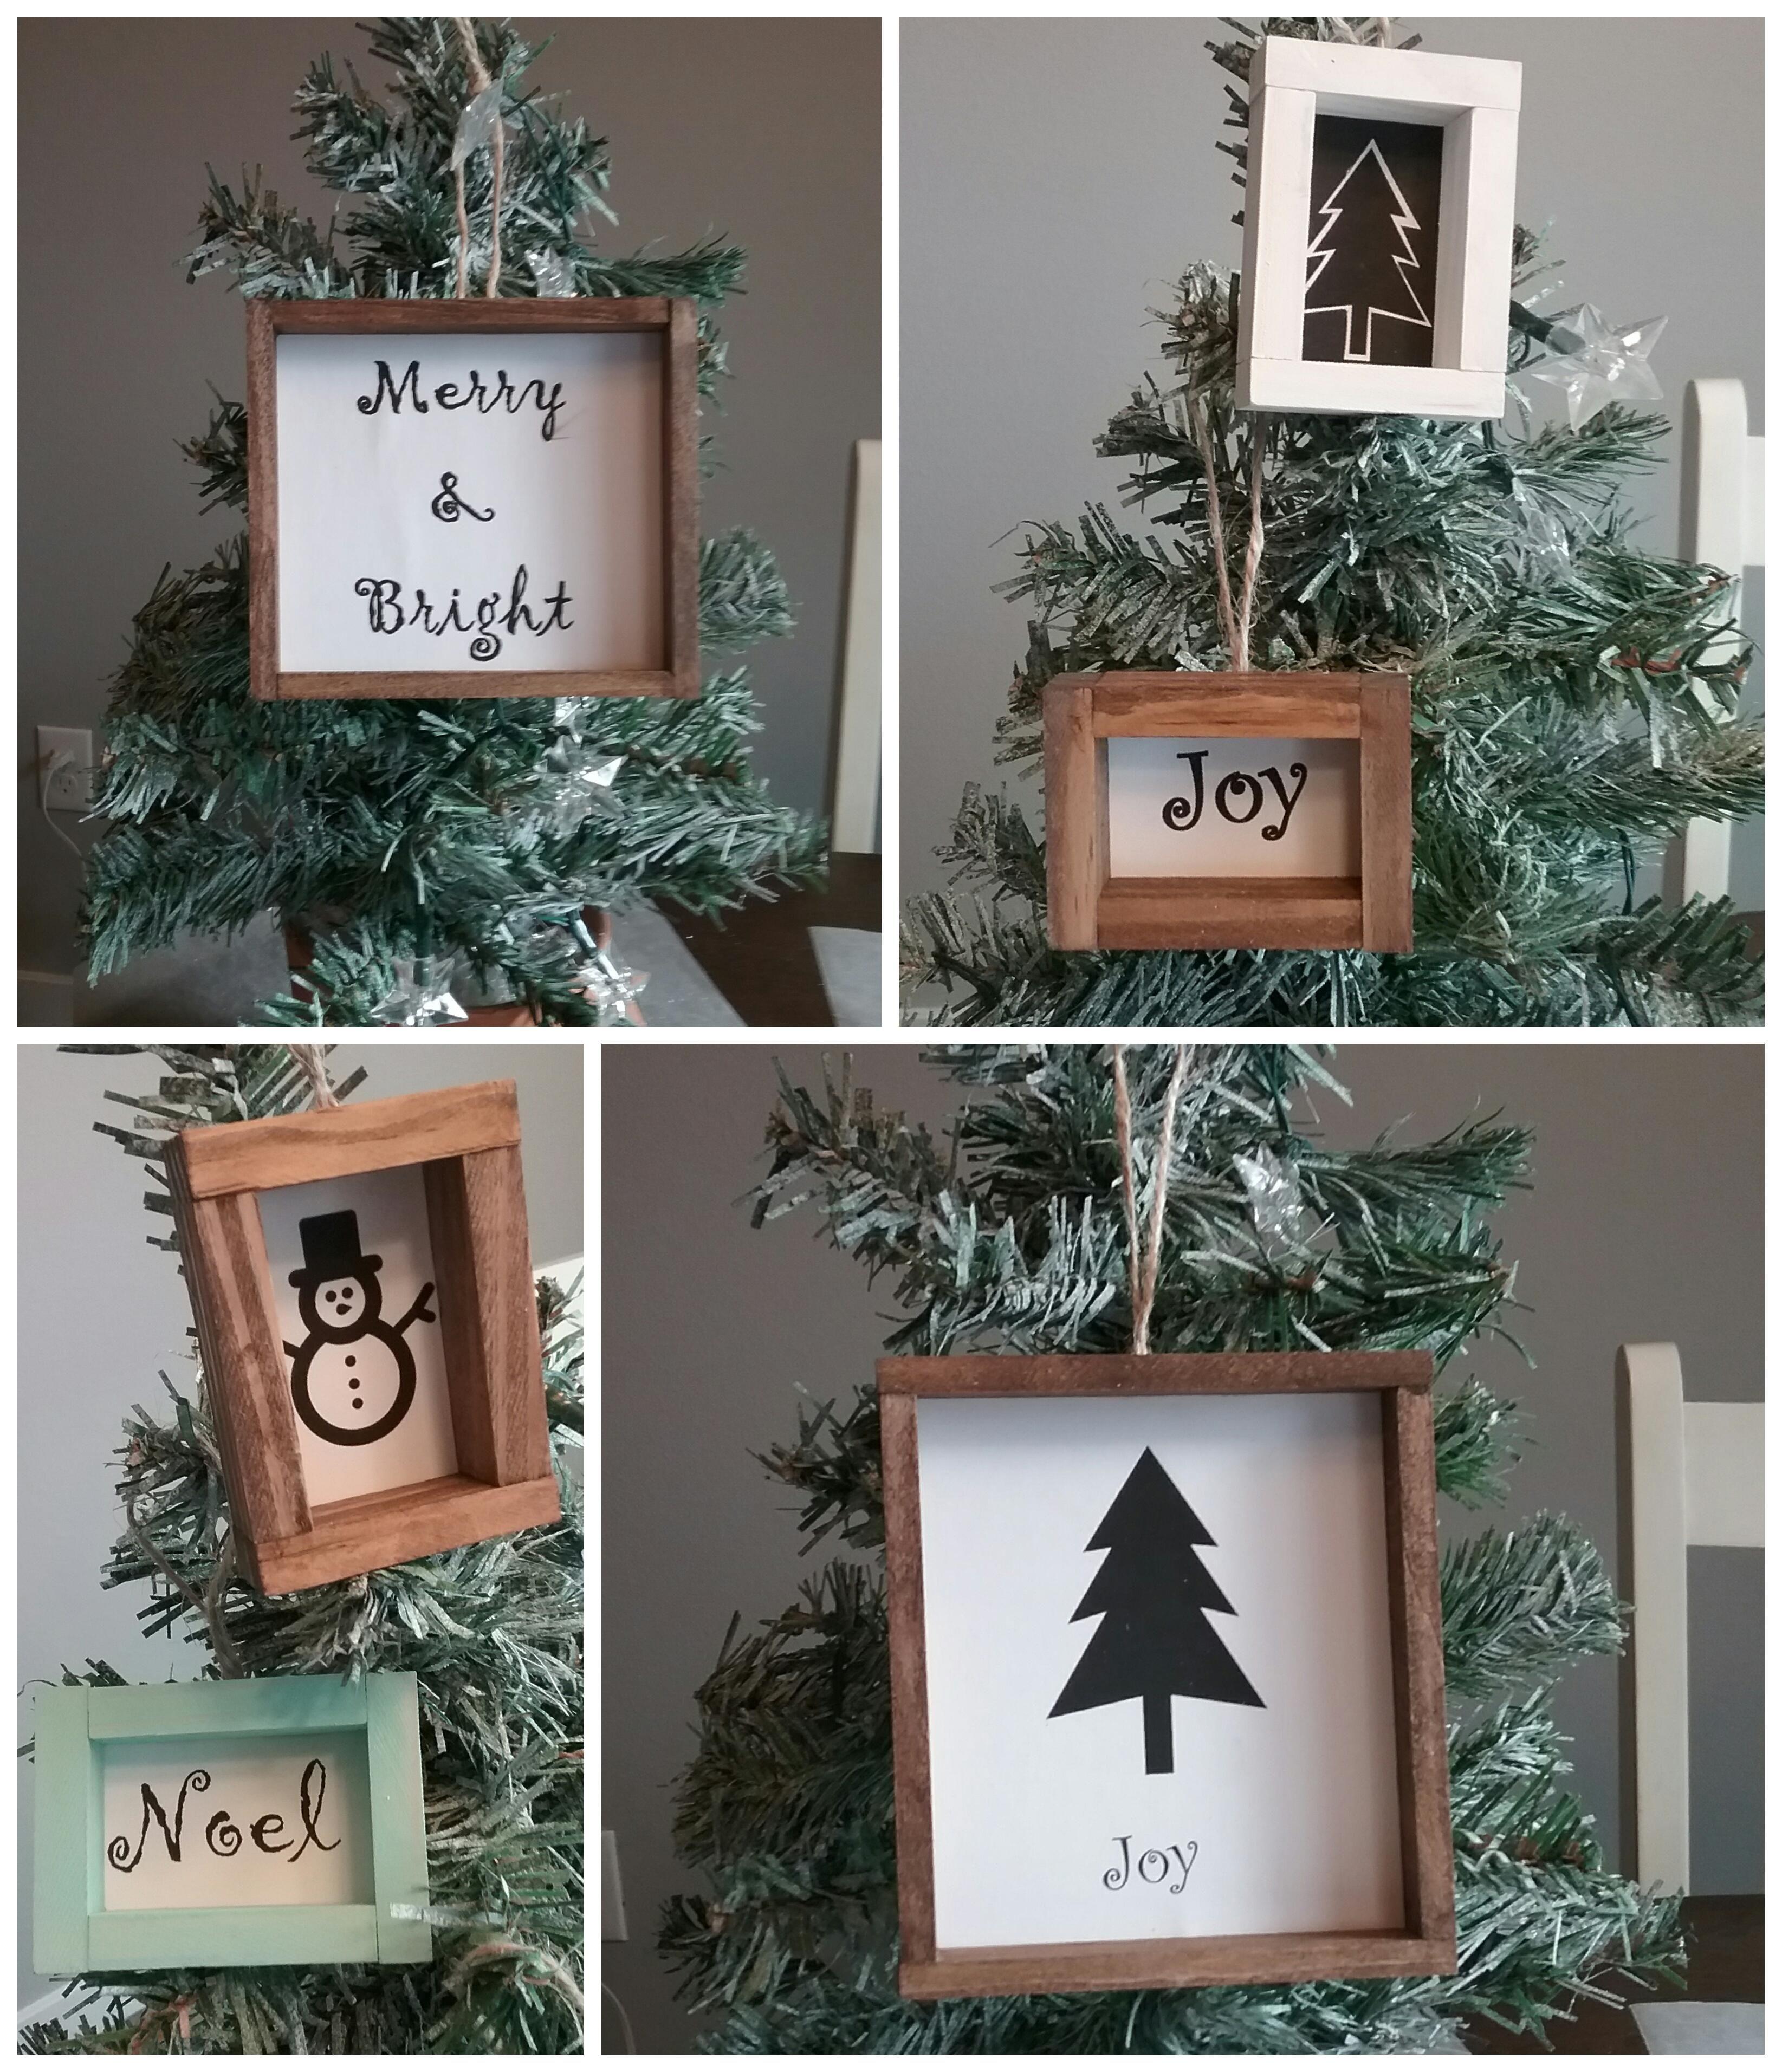 Dollar Tree Farmhouse Wood Christmas Ornaments Dollar Tree Diy Crafts Dollar Tree Diy Dollar Tree Crafts